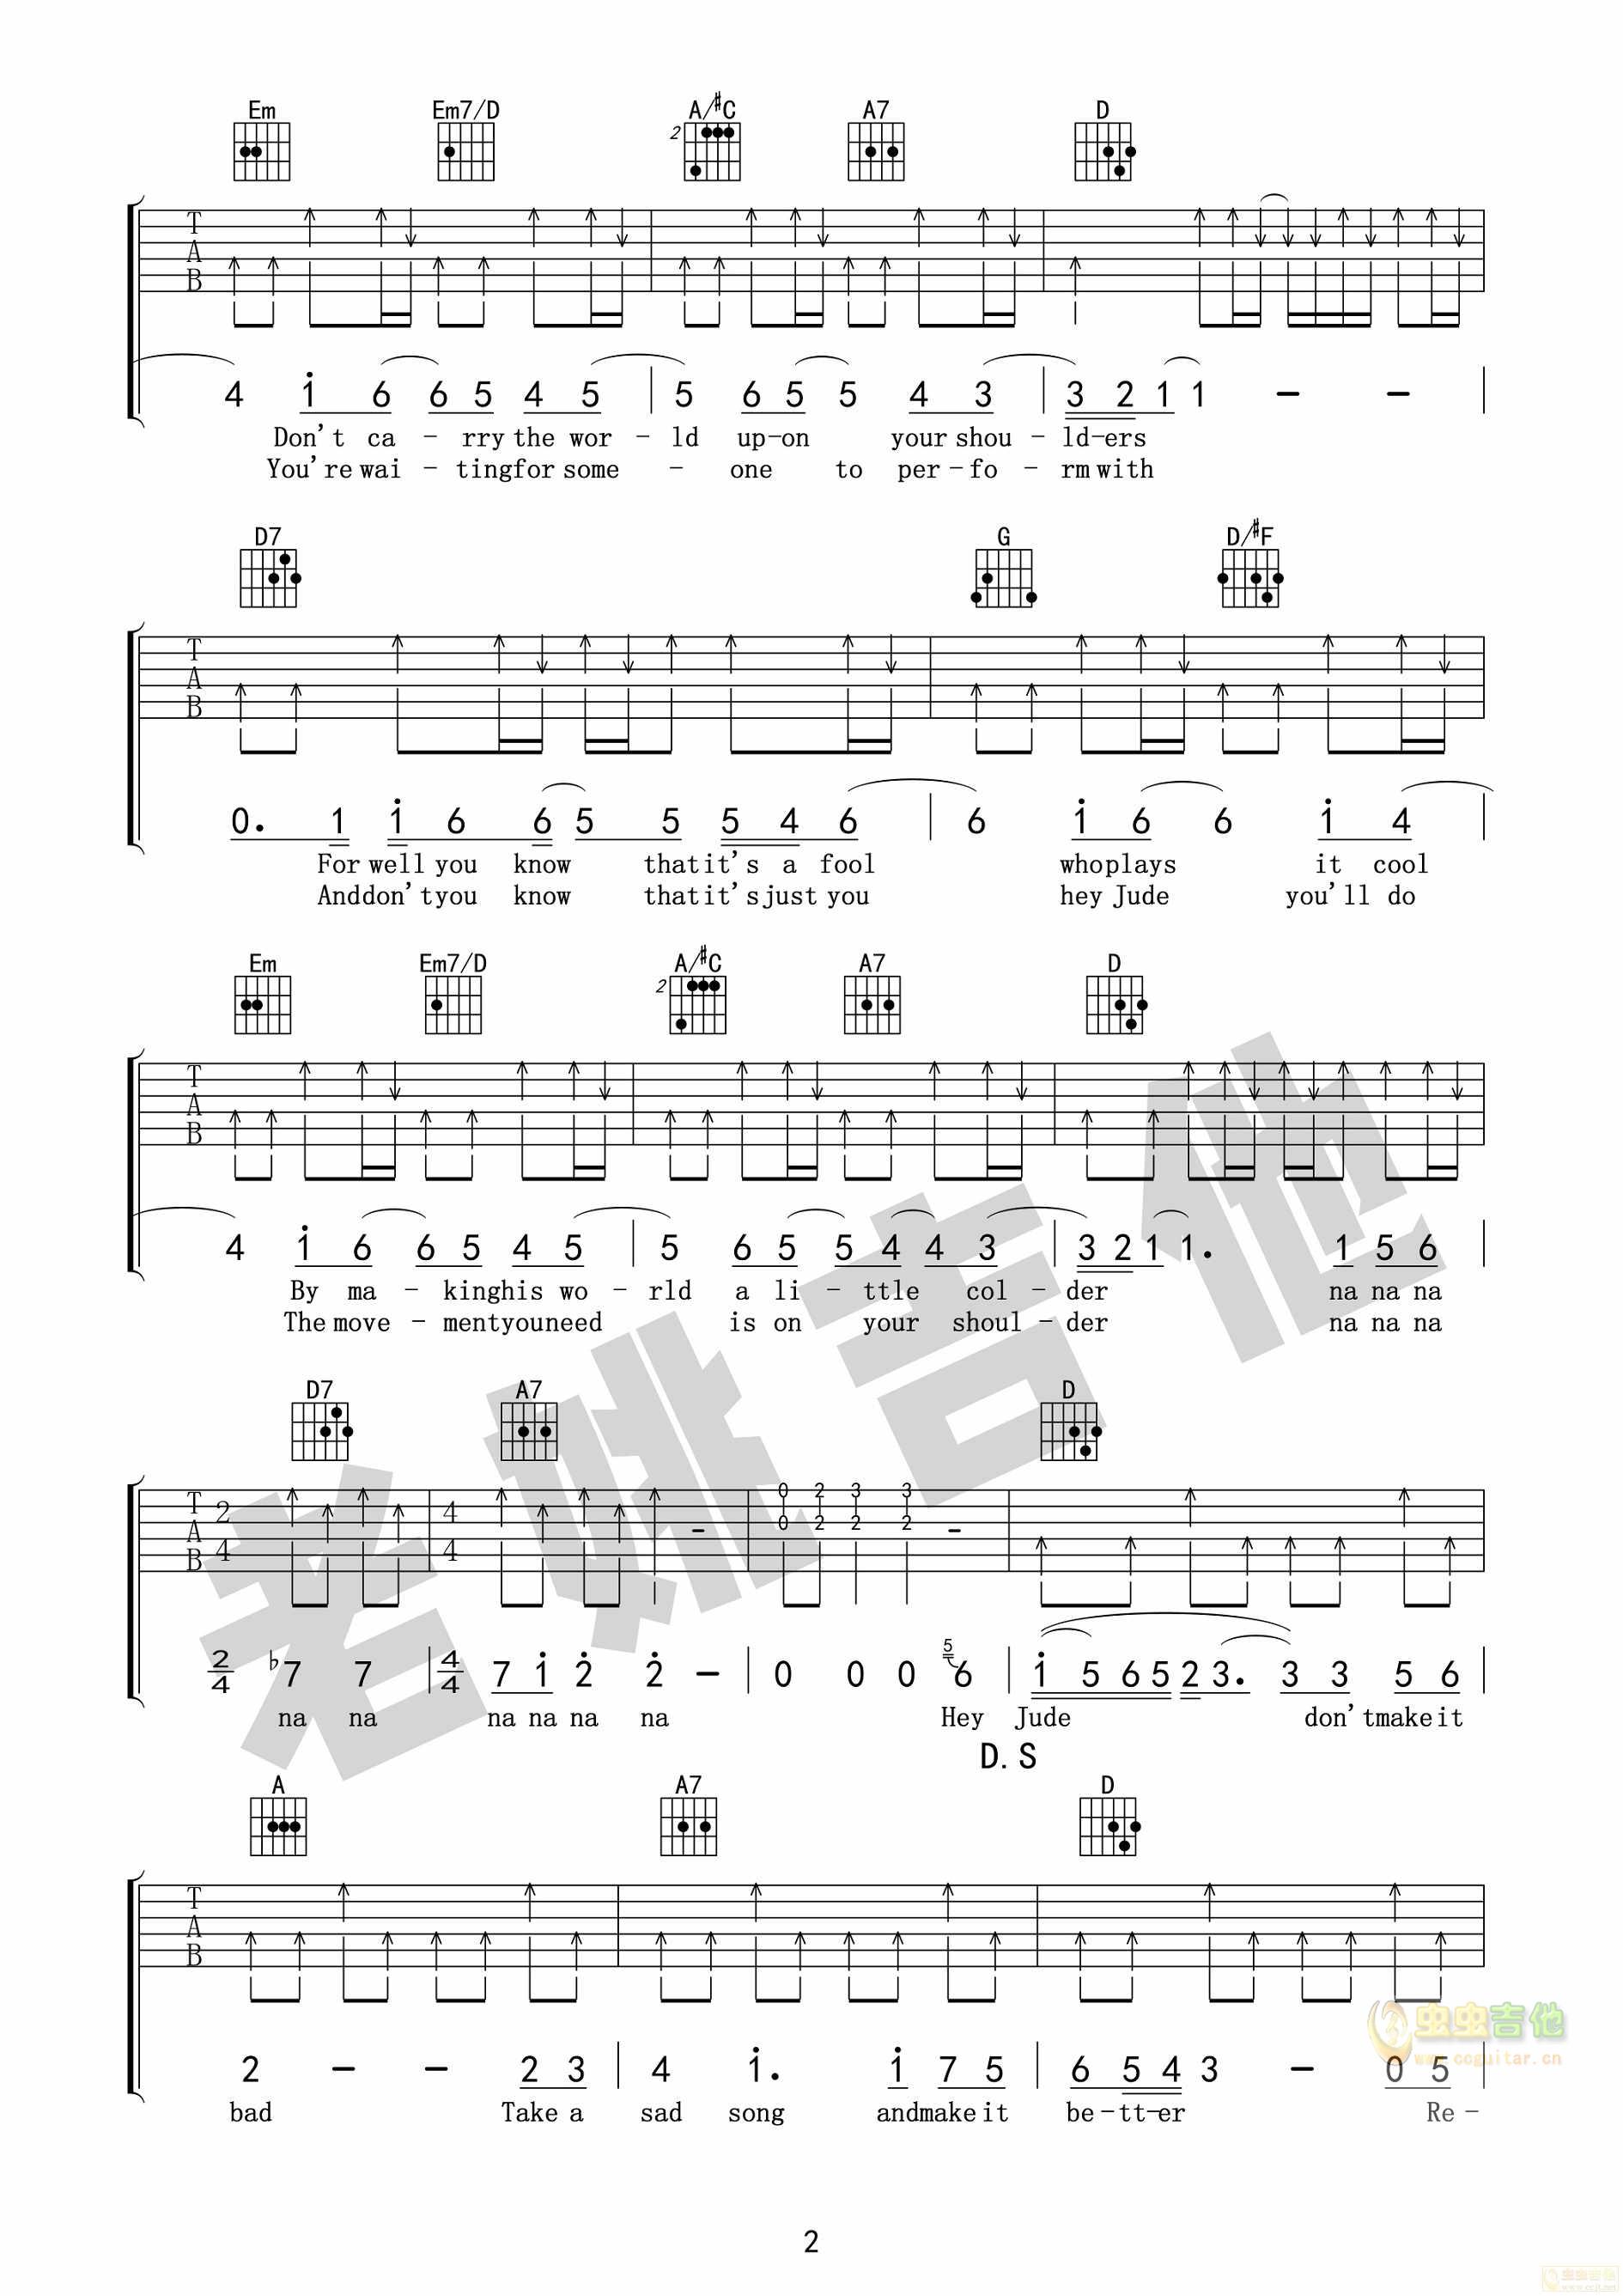 Hey Jude《嘿朱迪》吉他谱+视频教学[老姚吉他...-吉他谱-C大调音乐网